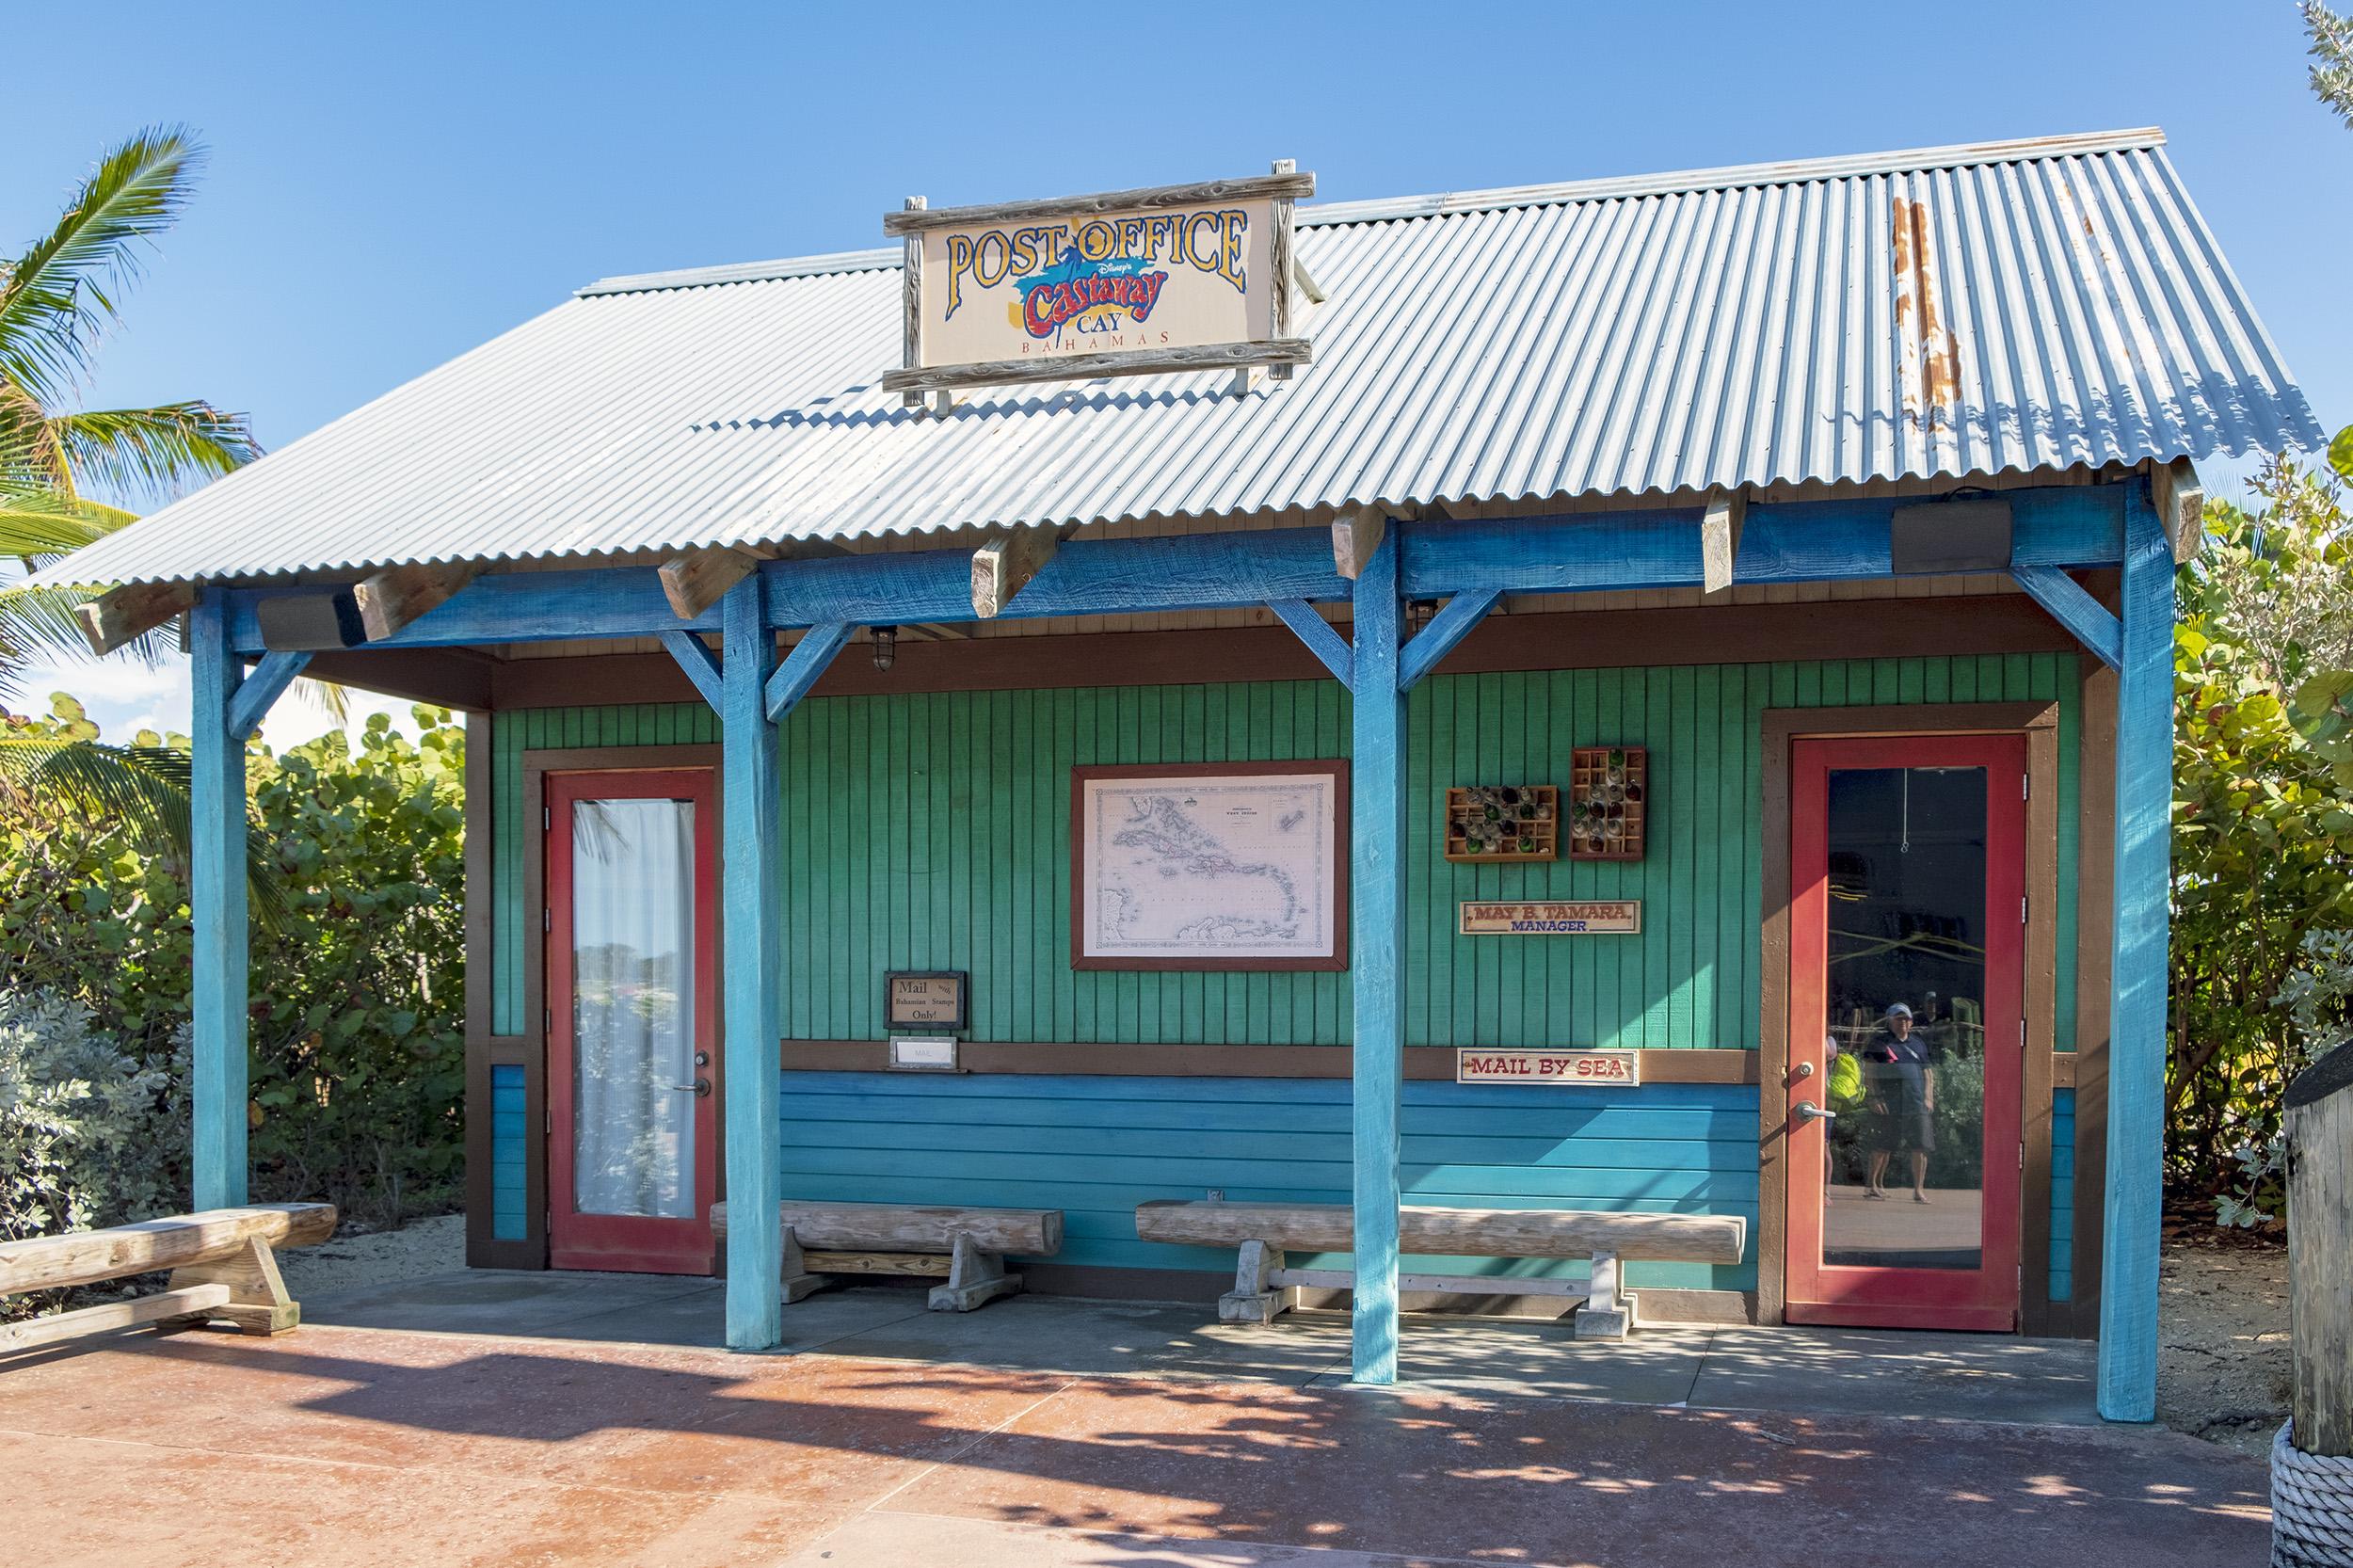 Post office Castaway Cay